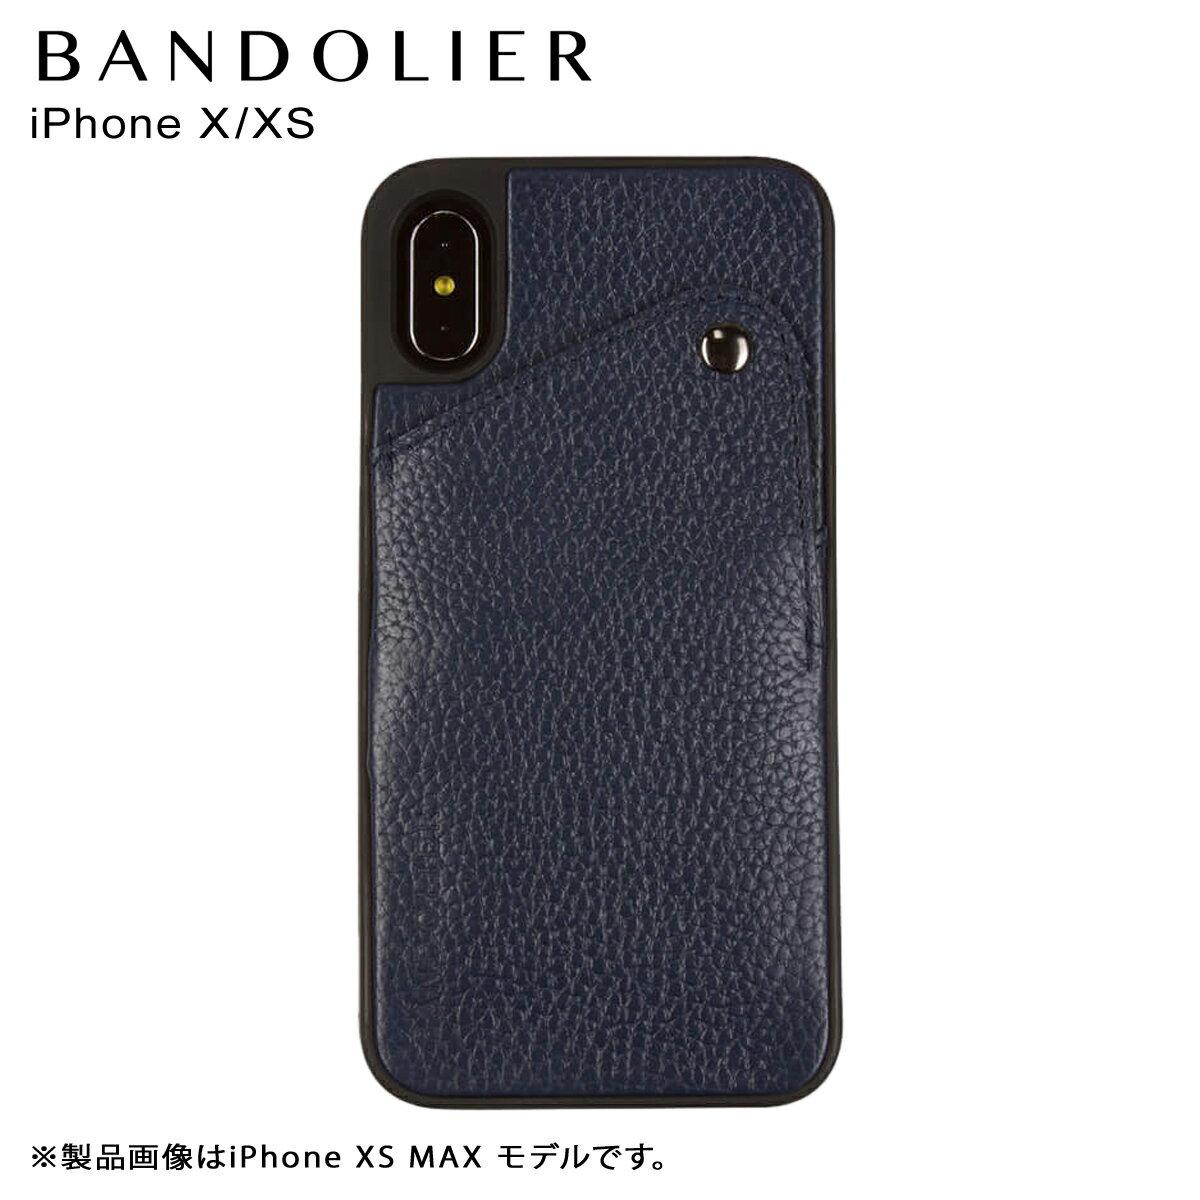 BANDOLIER バンドリヤー iPhone XS X ケース スマホ アイフォン レザー ALEX NAVY メンズ レディース ネイビー